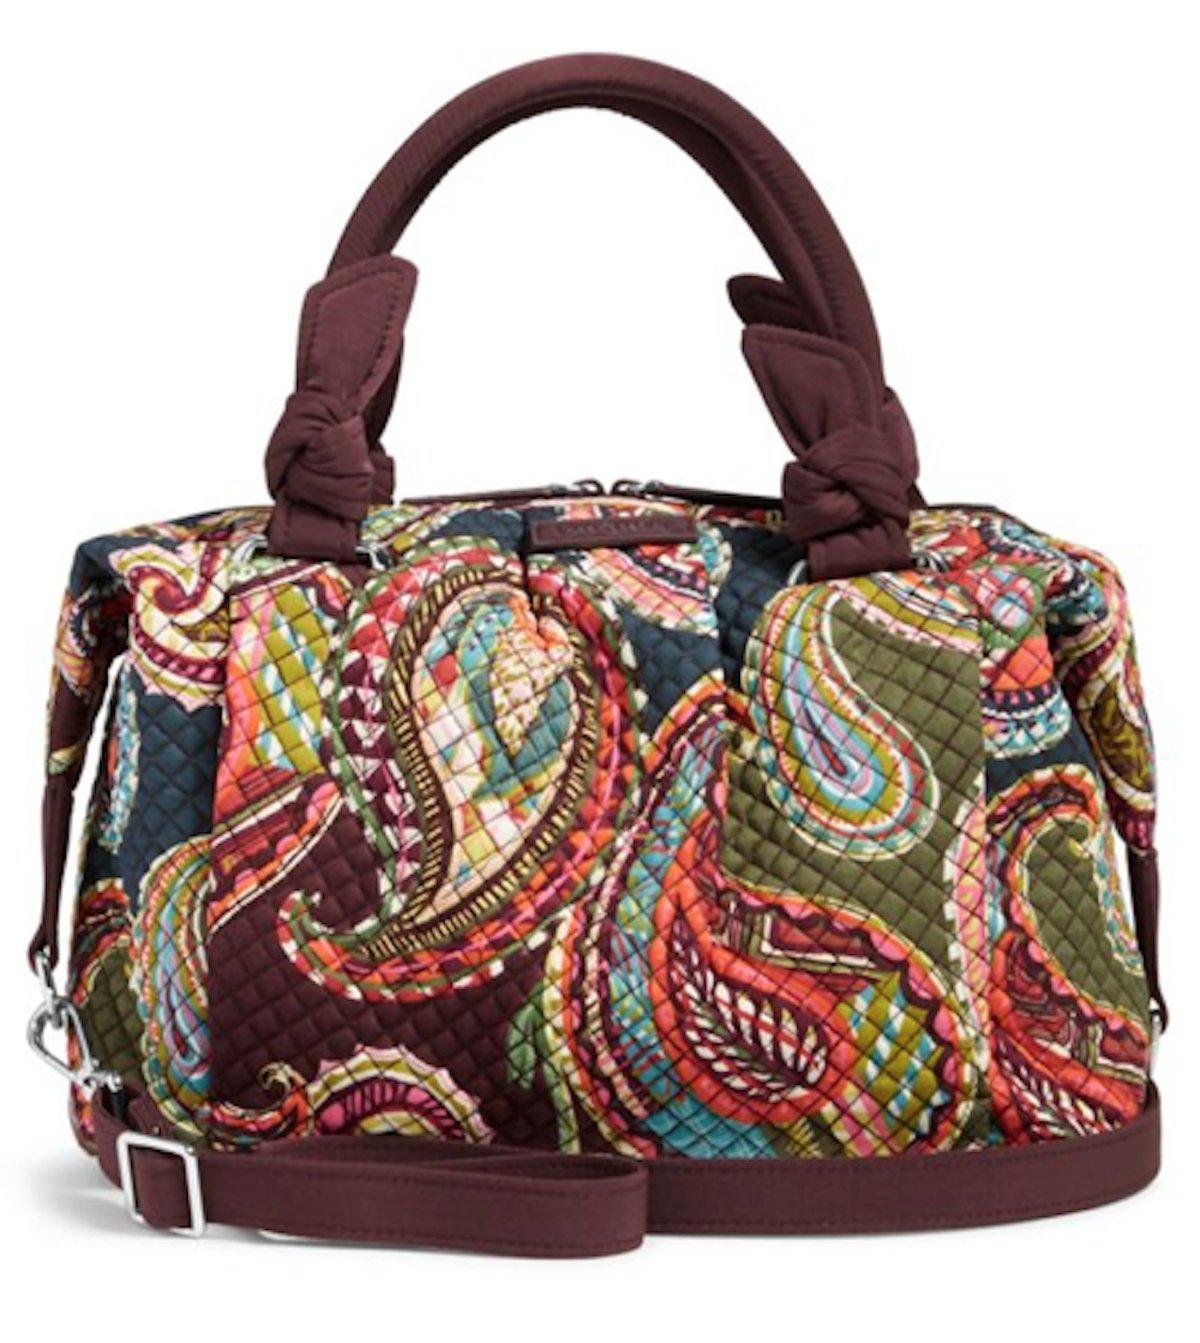 Vera Bradley Hadley Satchel Handbag (Heirloom paisley)